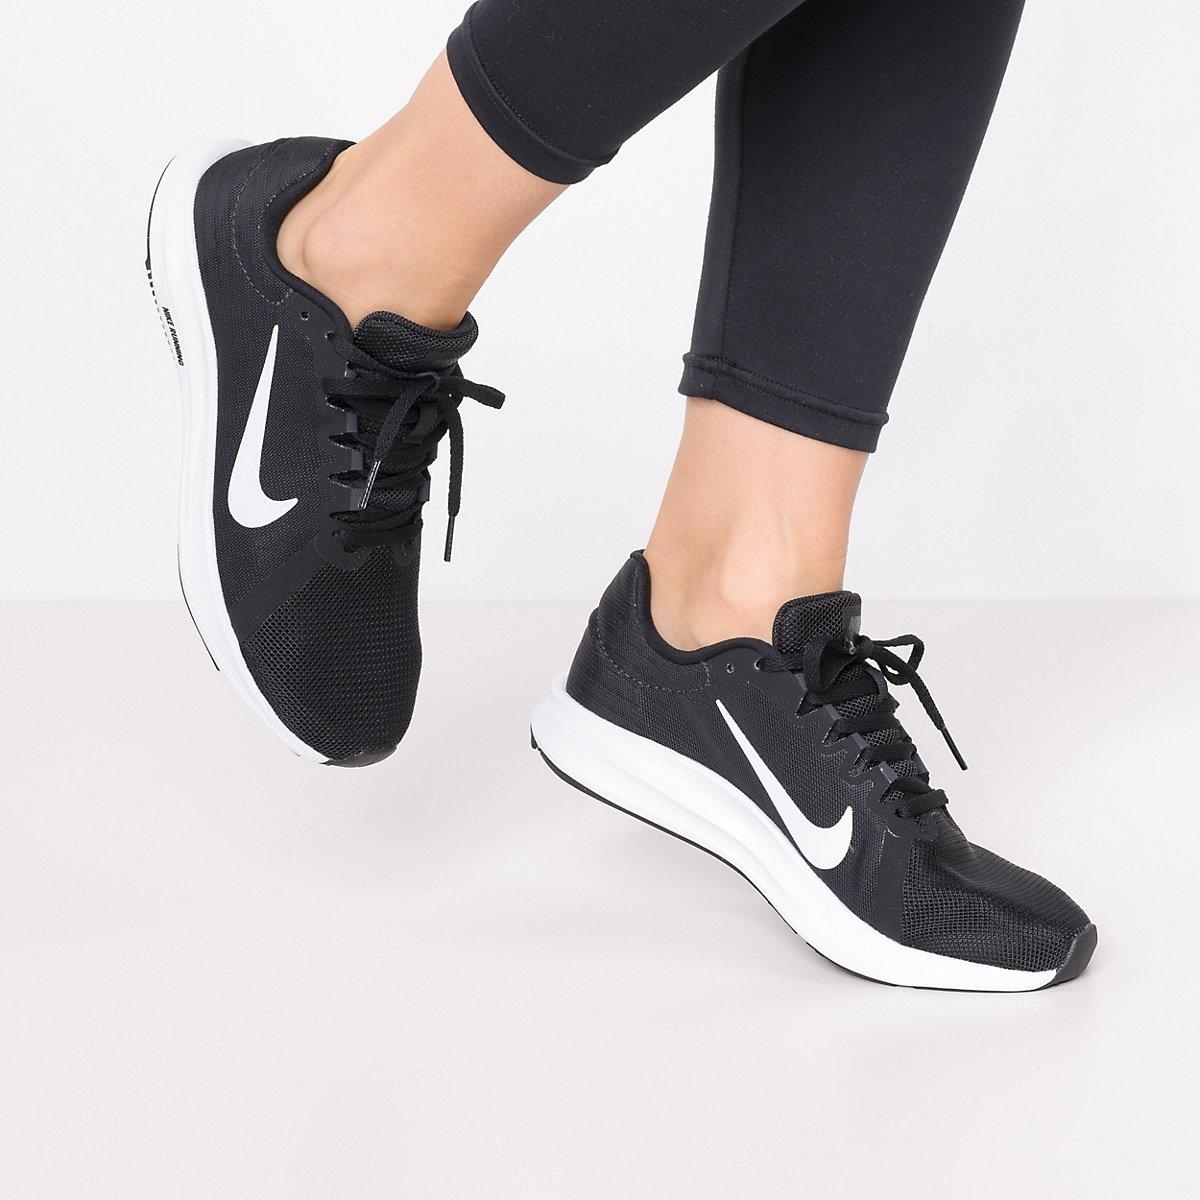 Nike Performance, Downshifter 8 Laufschuhe, Schwarz-kombi